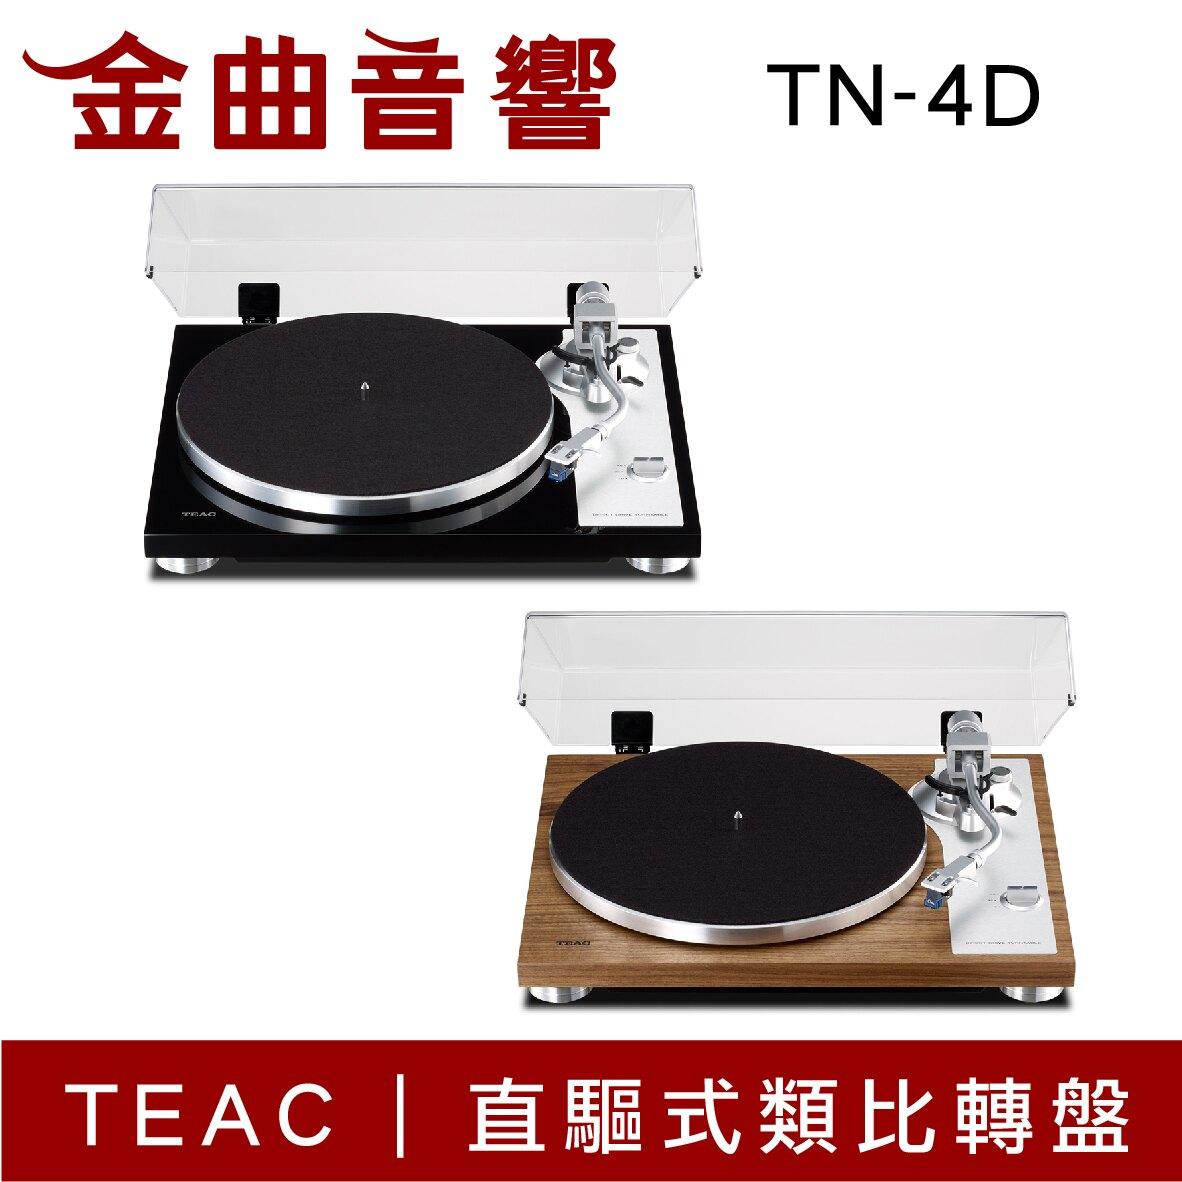 TEAC TN-4D 黑色 直驅式 類比轉盤 黑膠 唱盤 | 金曲音響